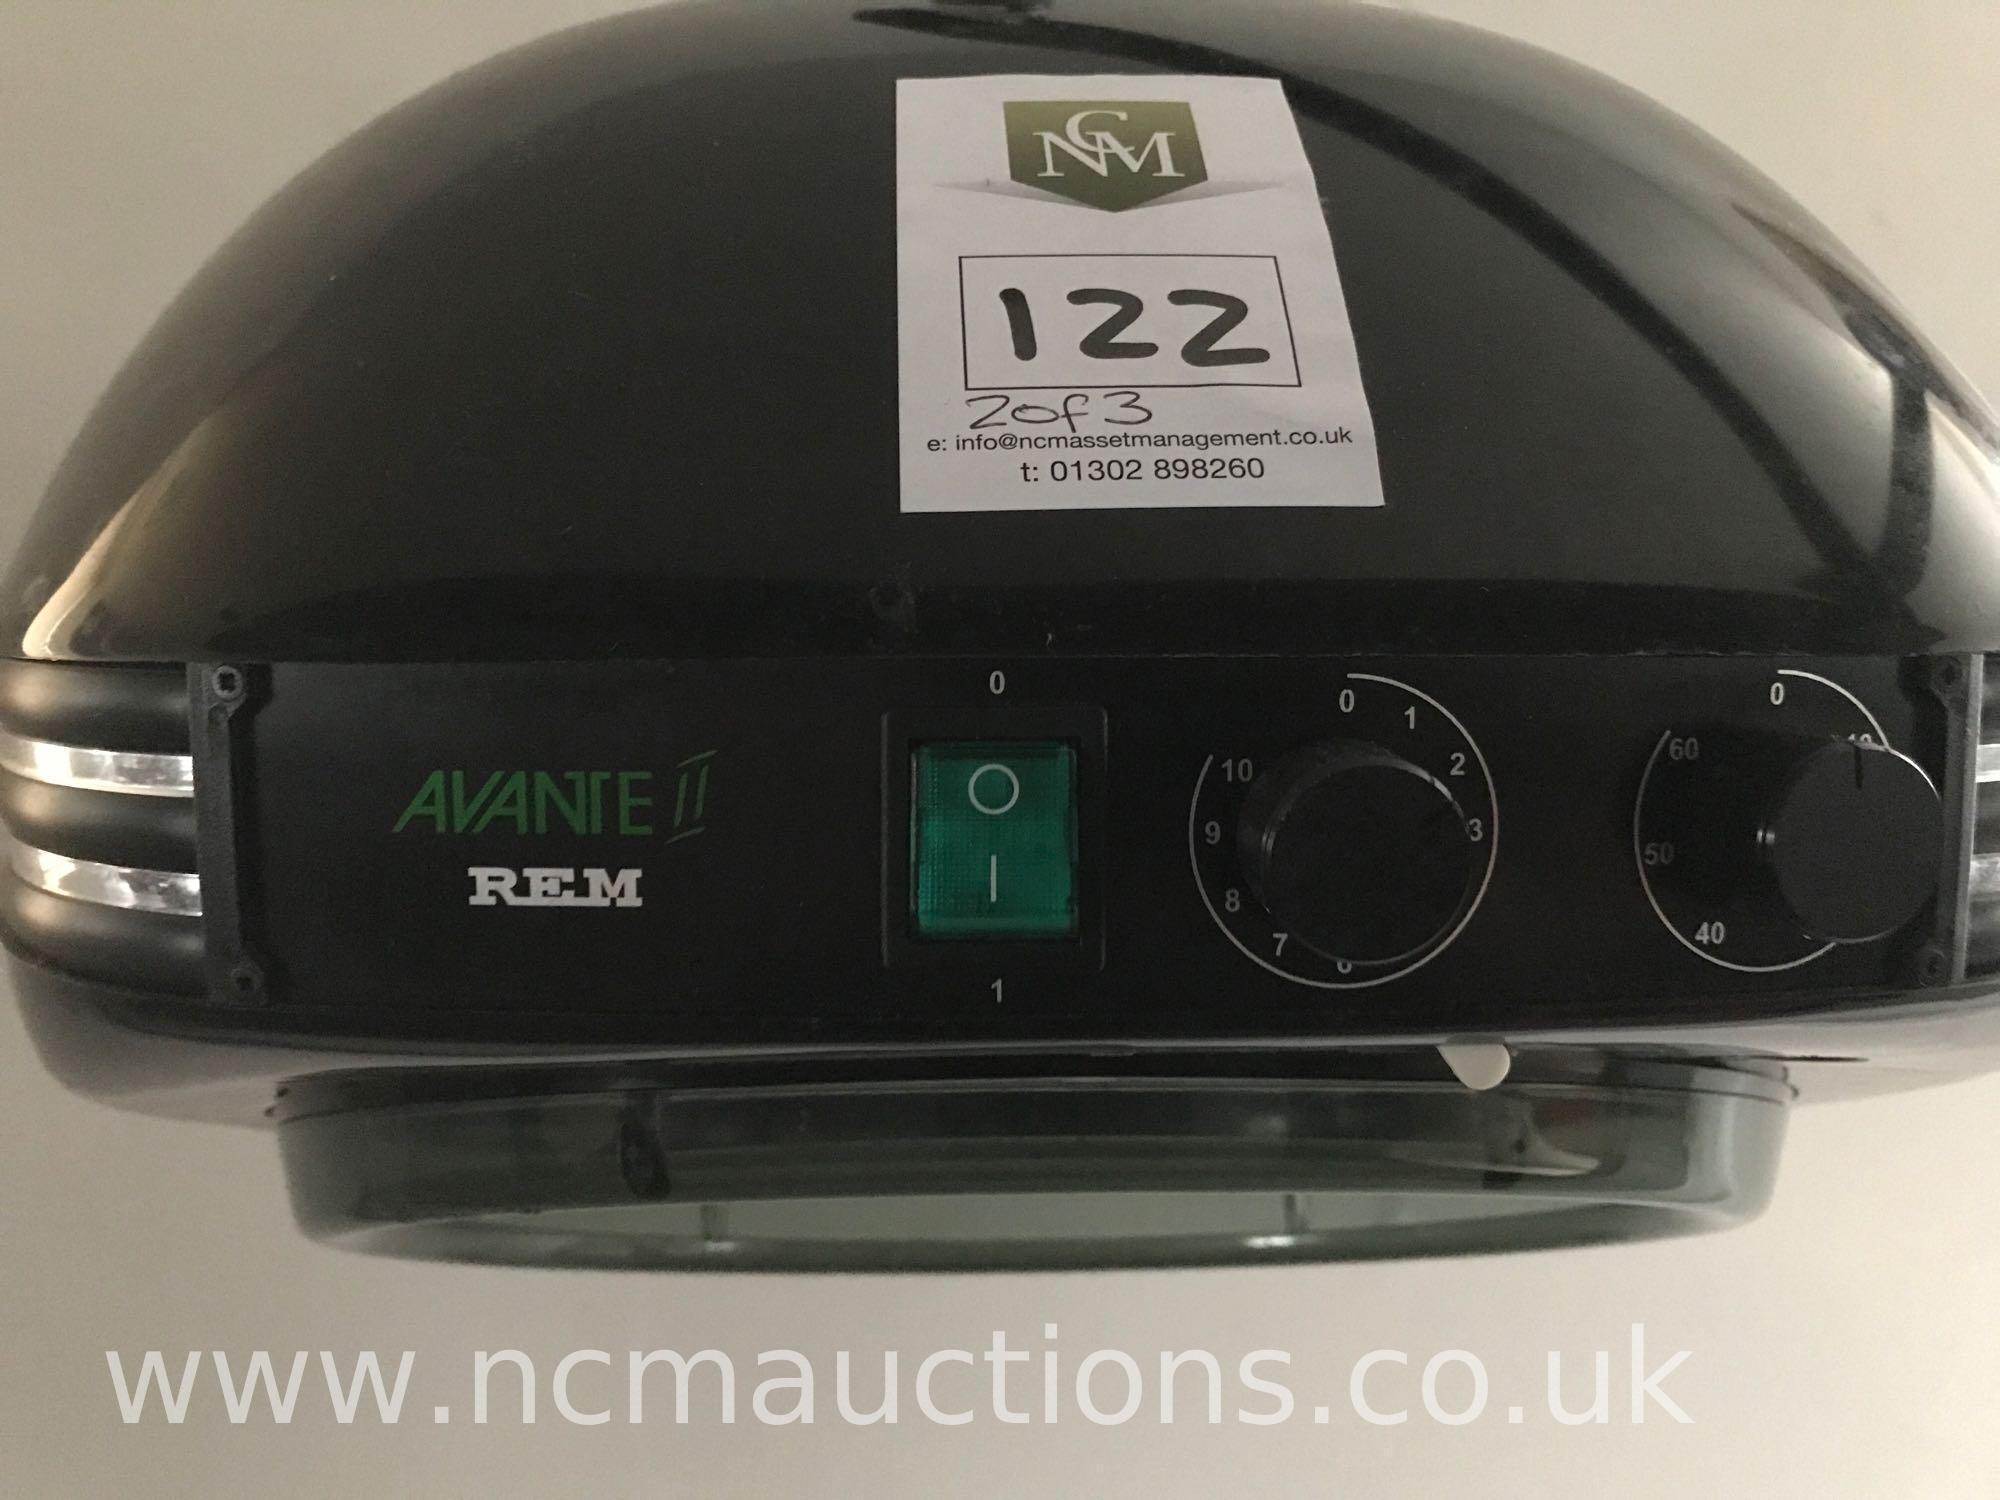 Los 122 - 2x Avante2 REM hair dryer and a Solara infra REM hair setter